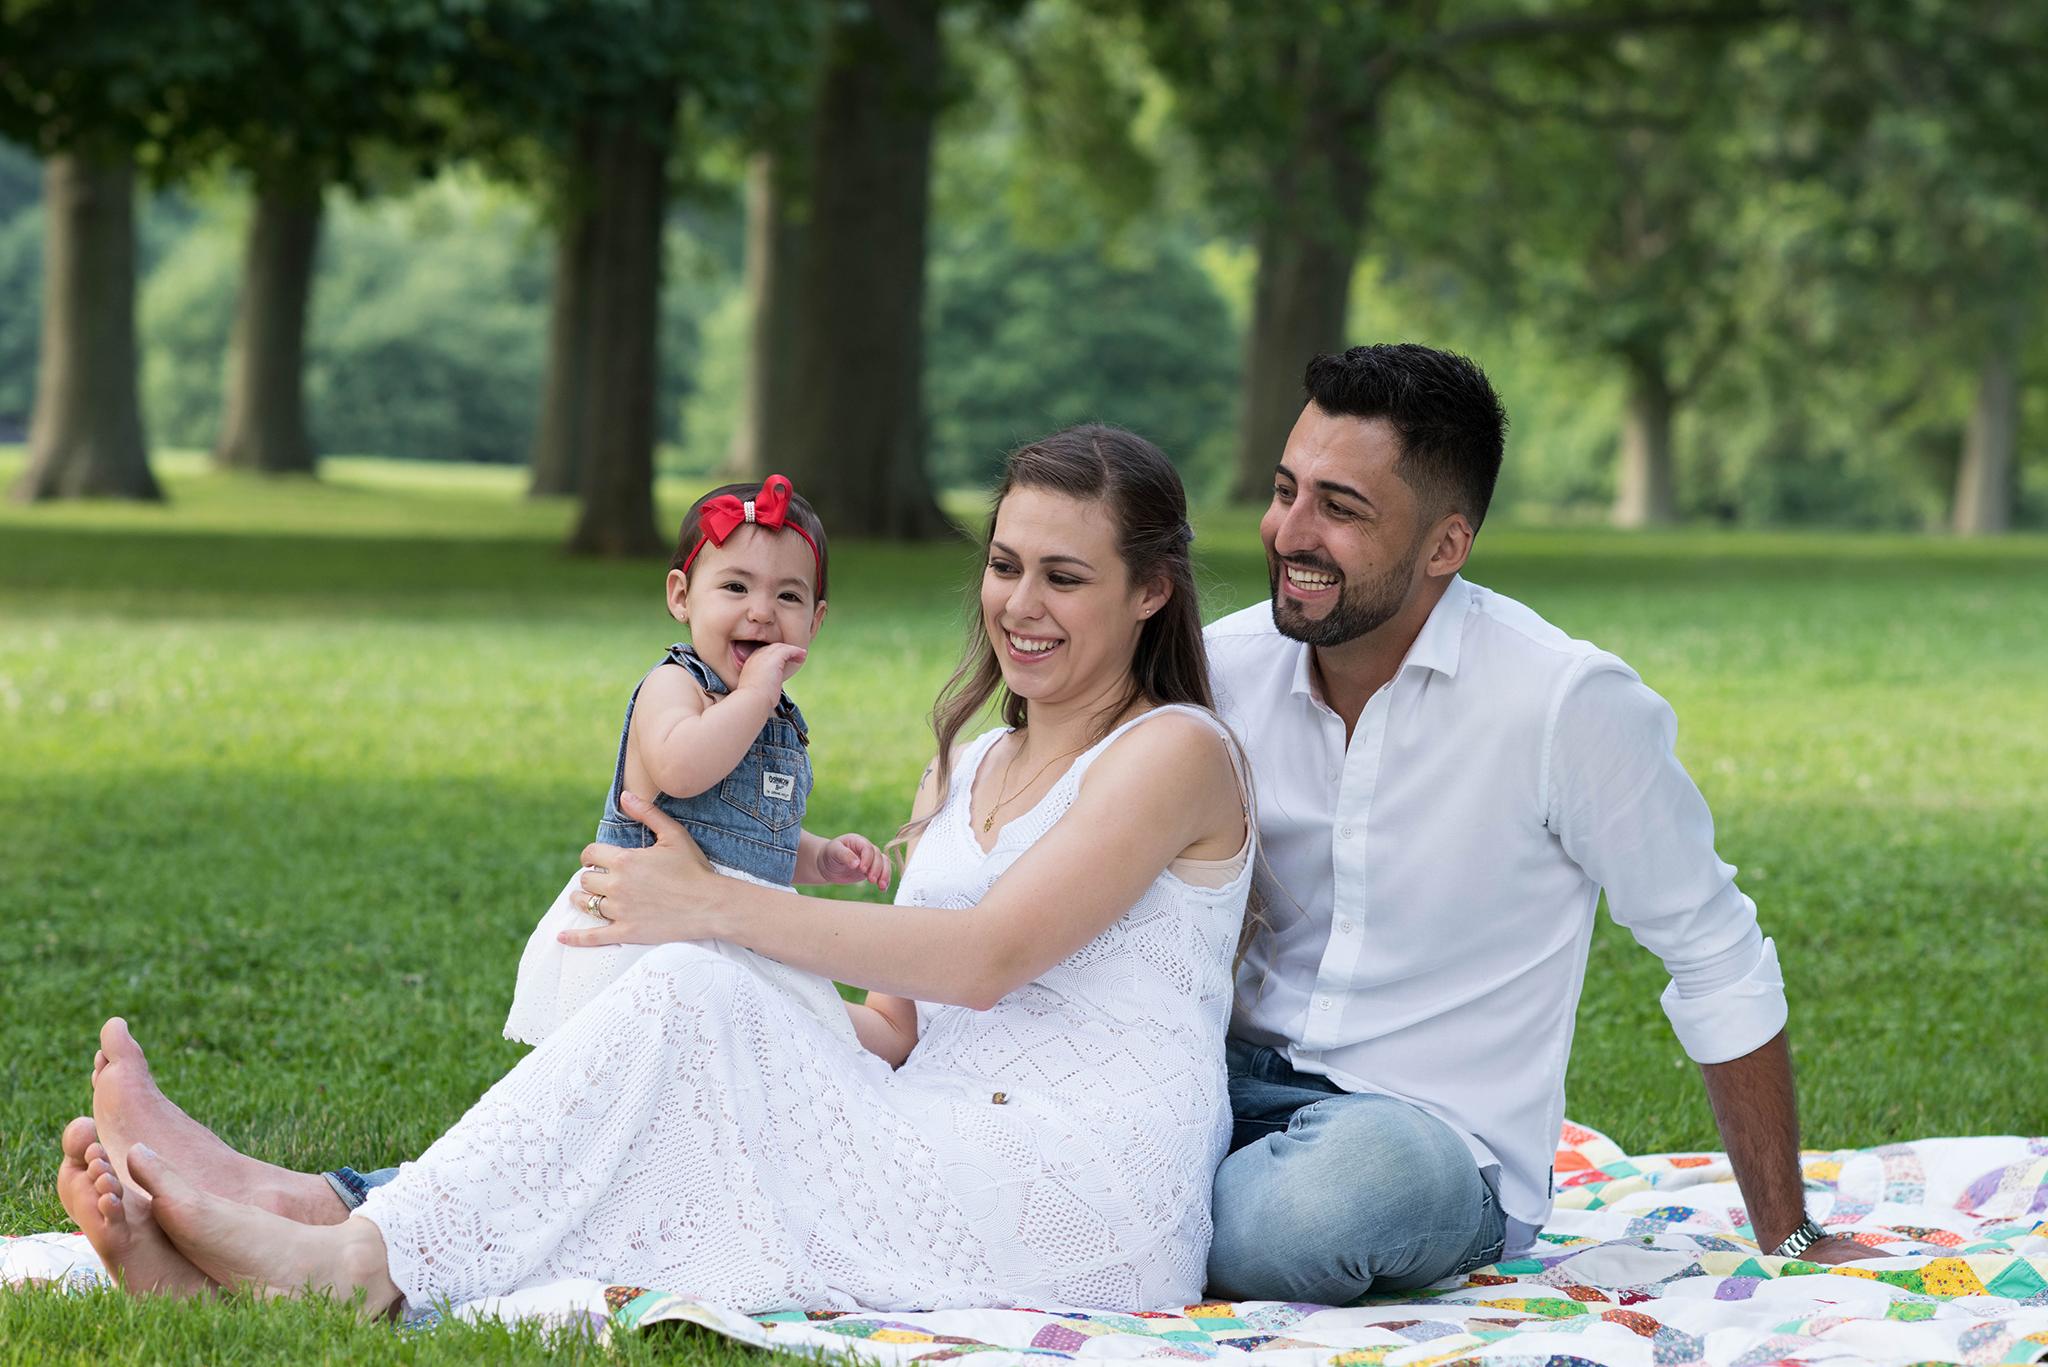 NJ-Newborn-family-Photographer-09.JPG